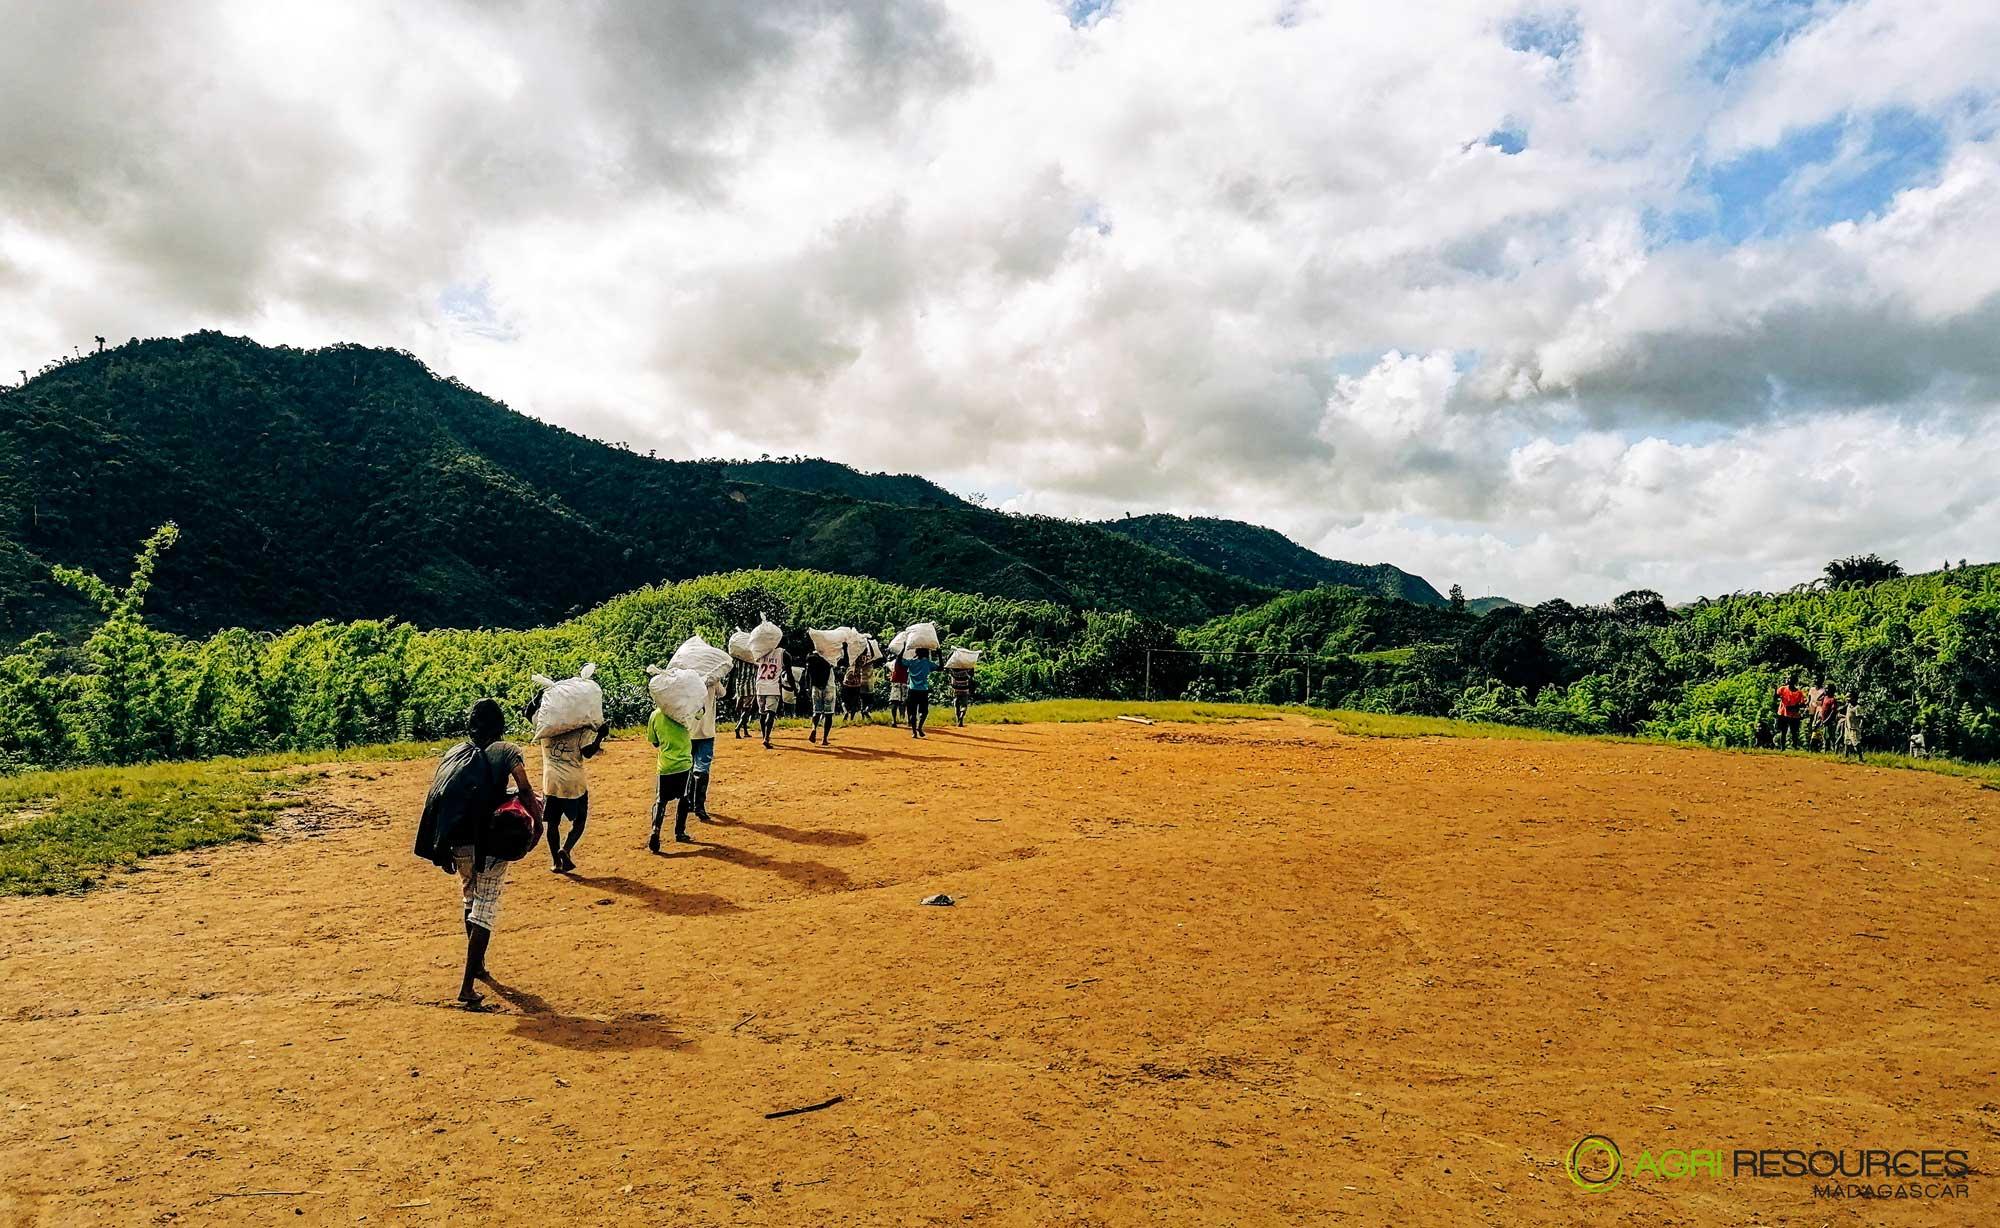 Green-Vanilla-Campaign-2021---Agri-Resources-Madagascar-5